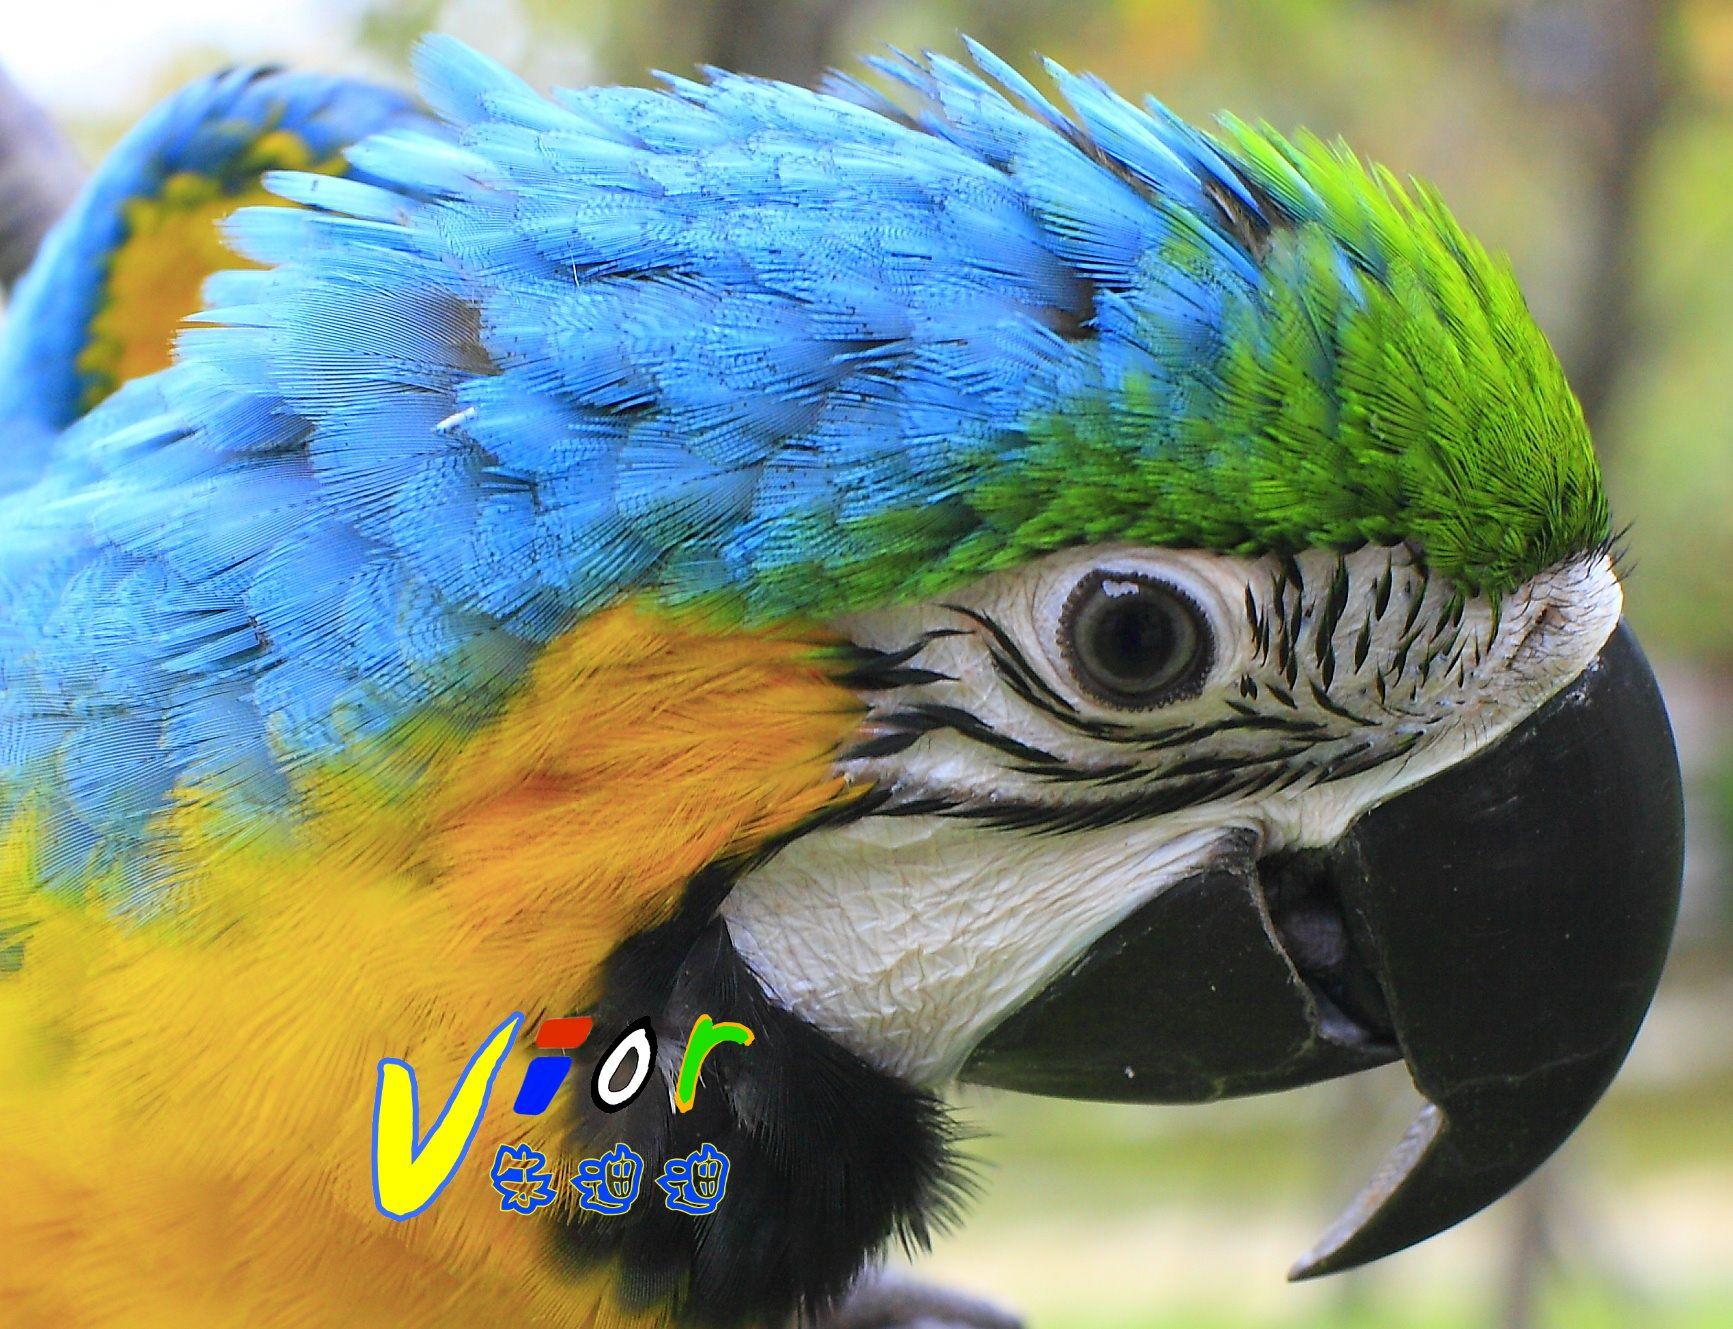 Blue and Gold Macaw VIOR(Parrot Vior)琉璃金剛鸚鵡 朱迪迪 | Animals, Macaw, Parrot